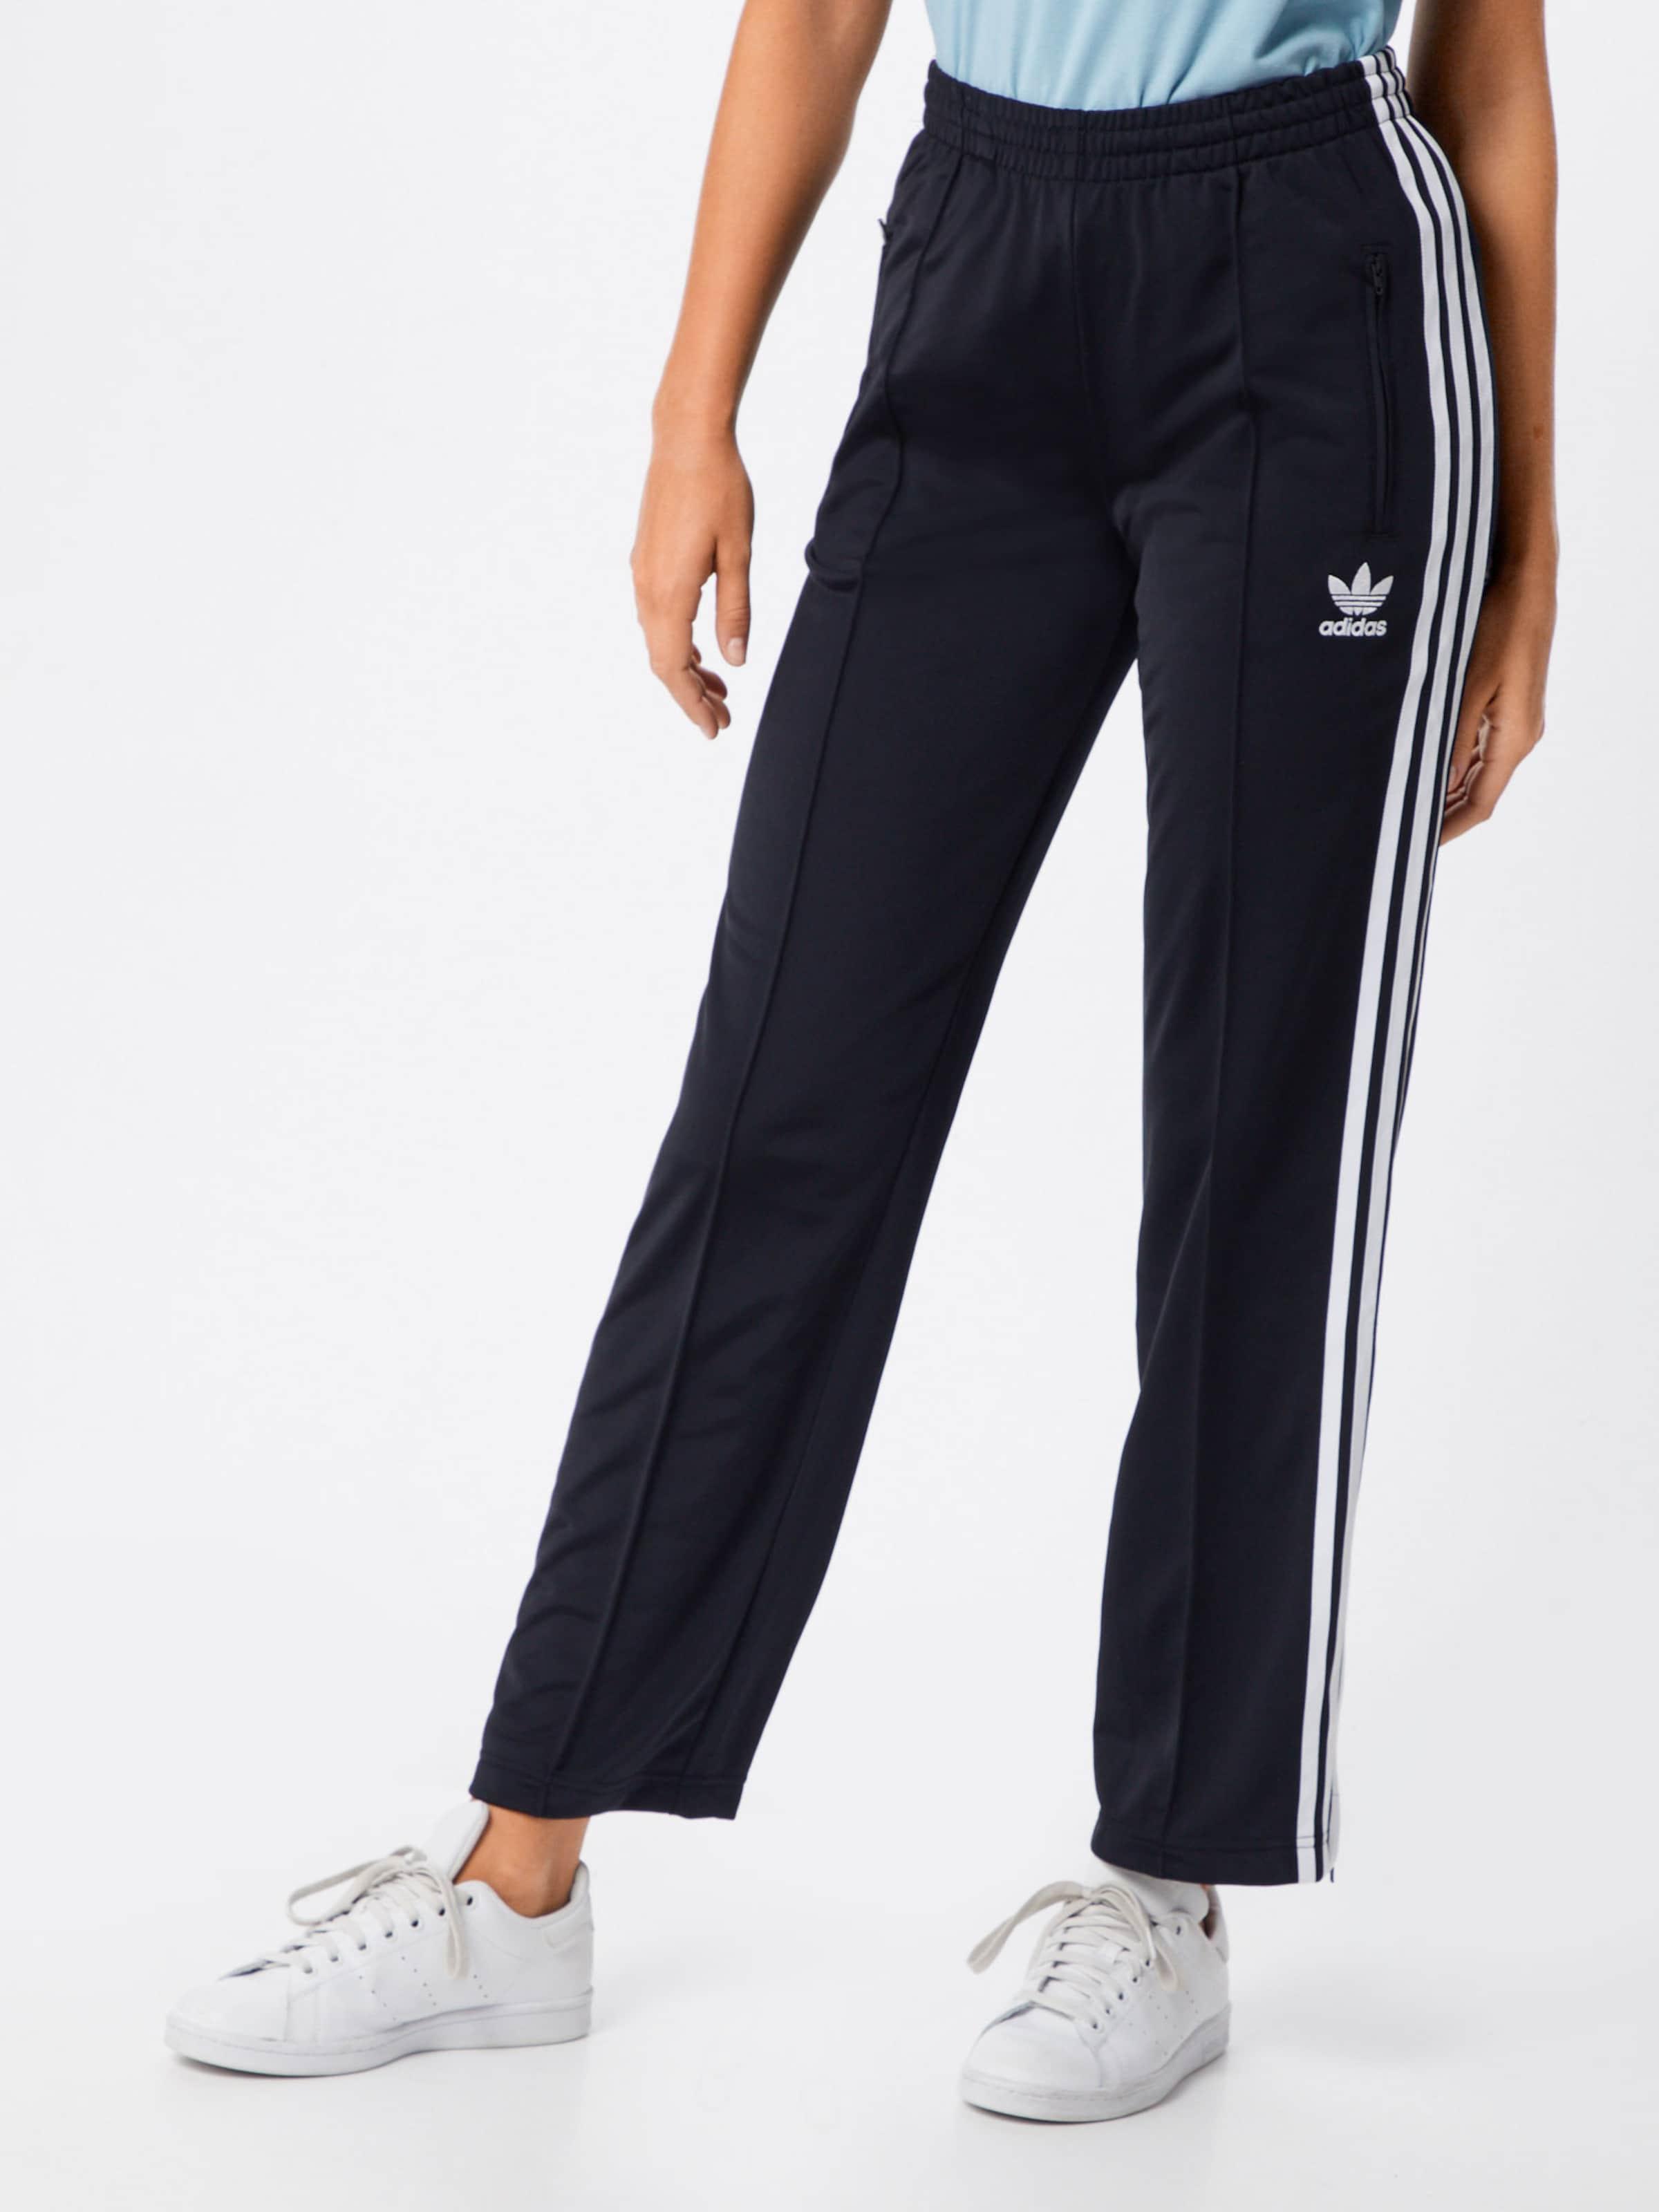 Pantalon Adidas Originals 'firebird Marine En Tp' Bleu nOXN0PZ8wk